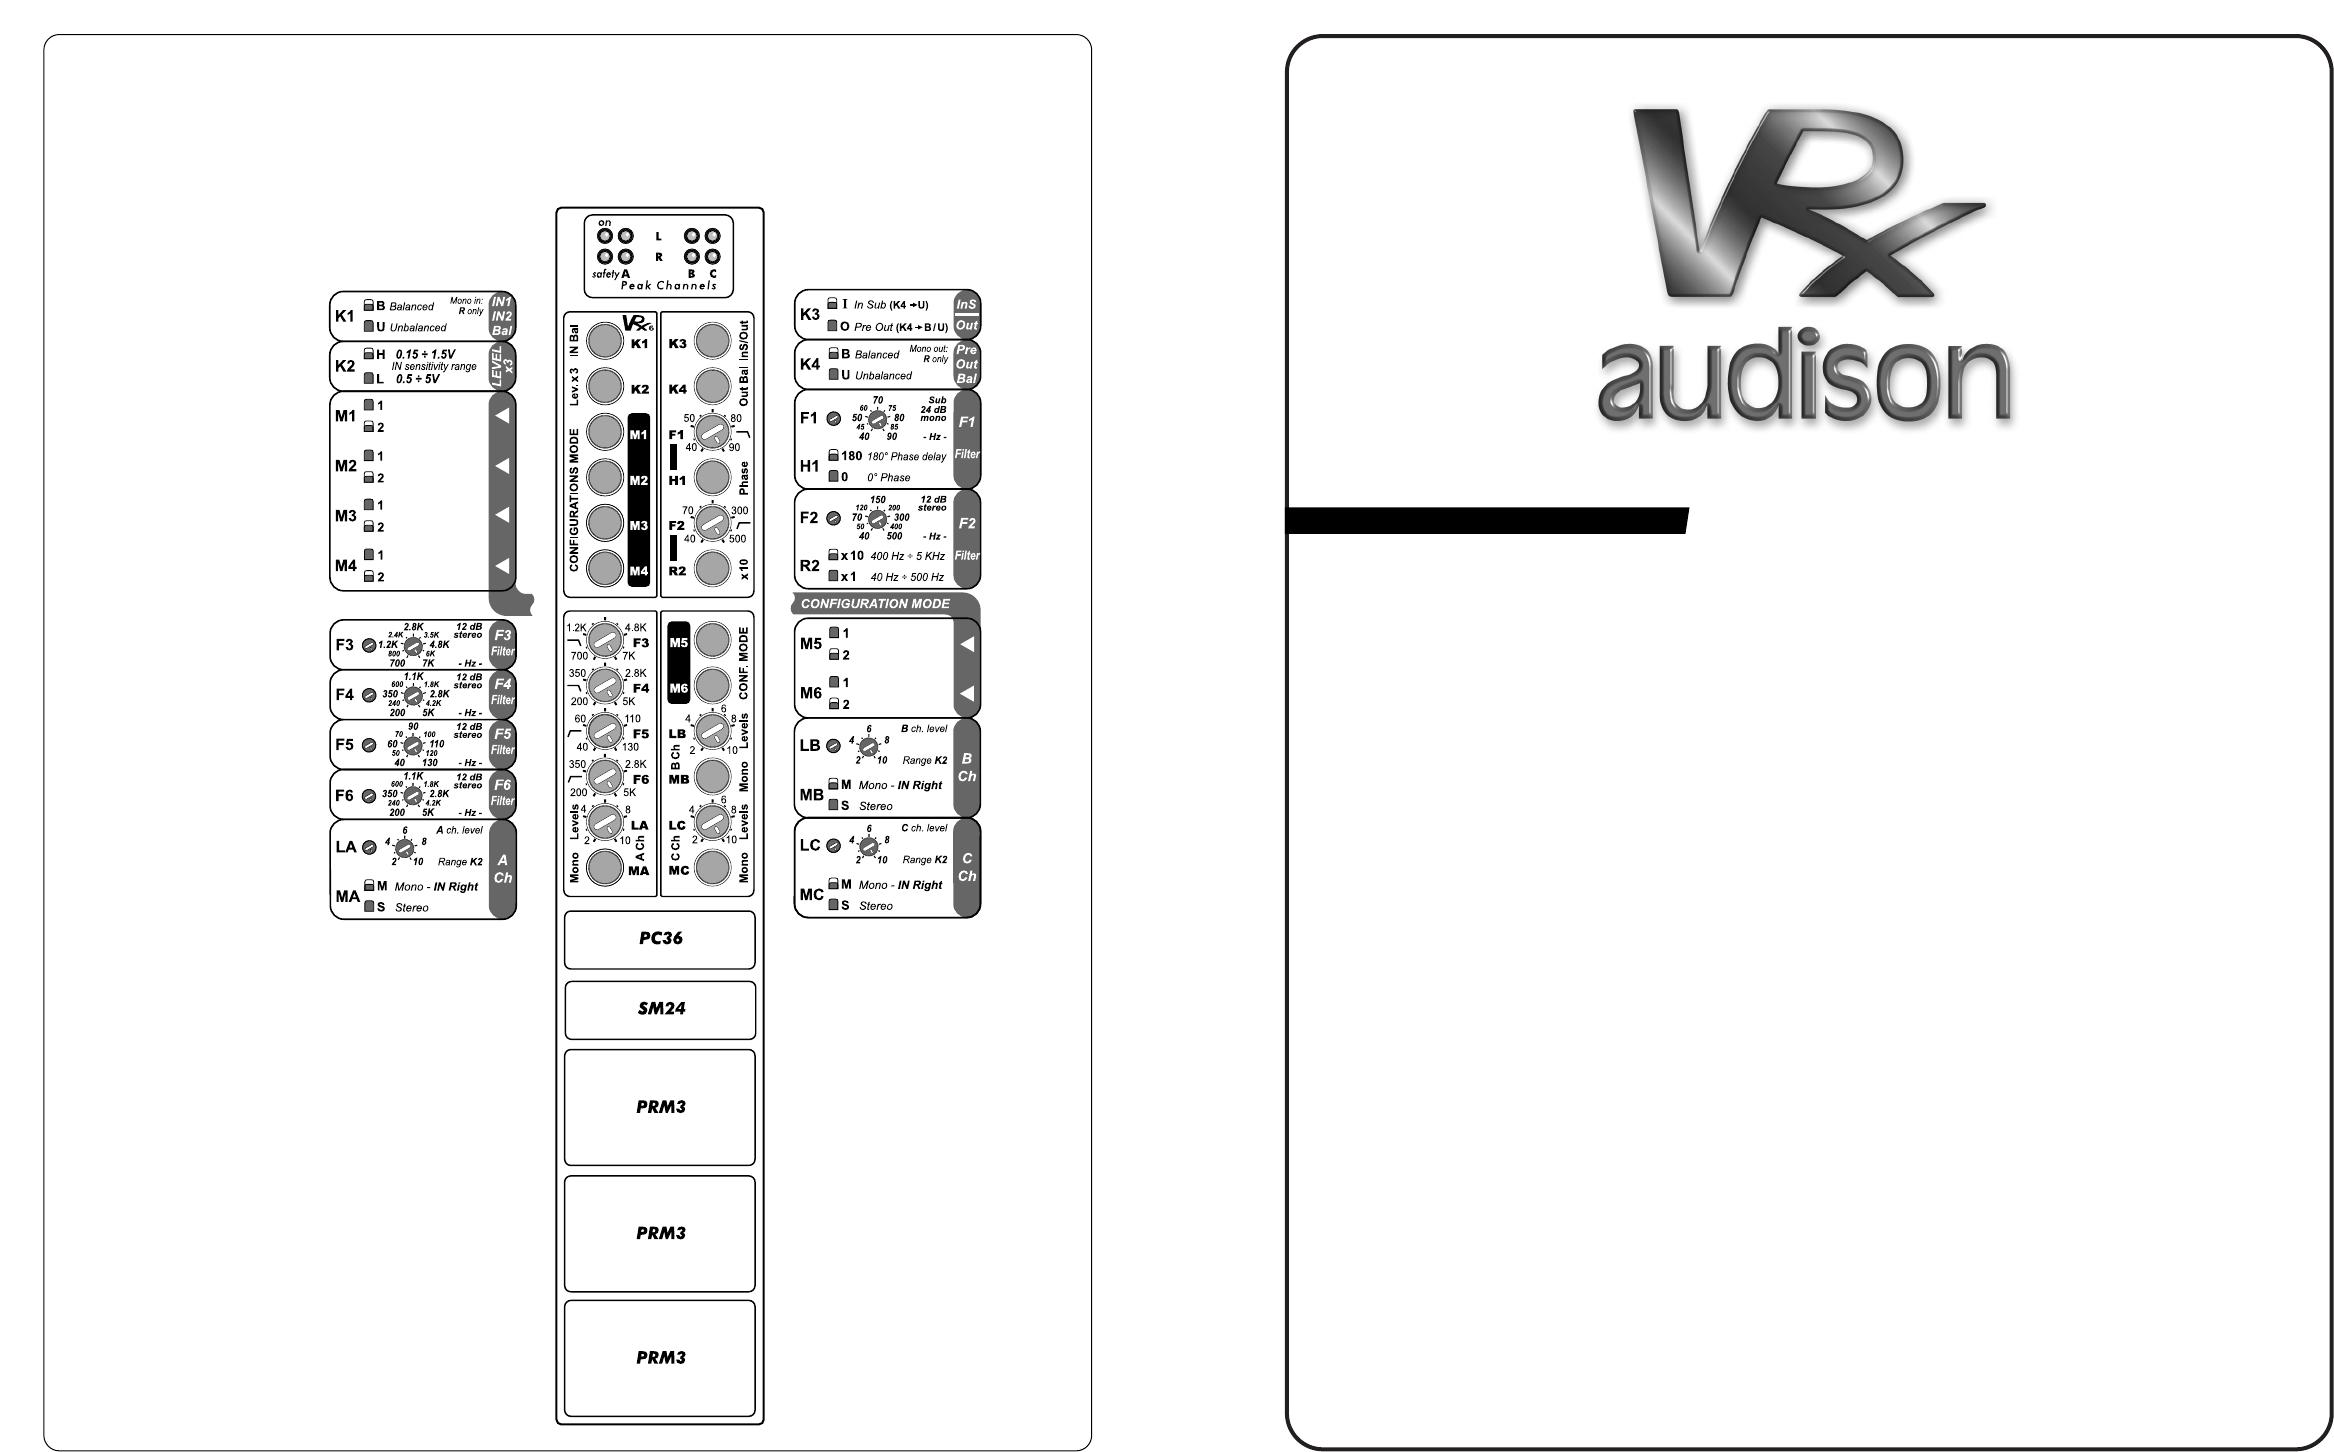 handleiding audison vrx 2 150  pagina 7 van 36   14 38 mb english